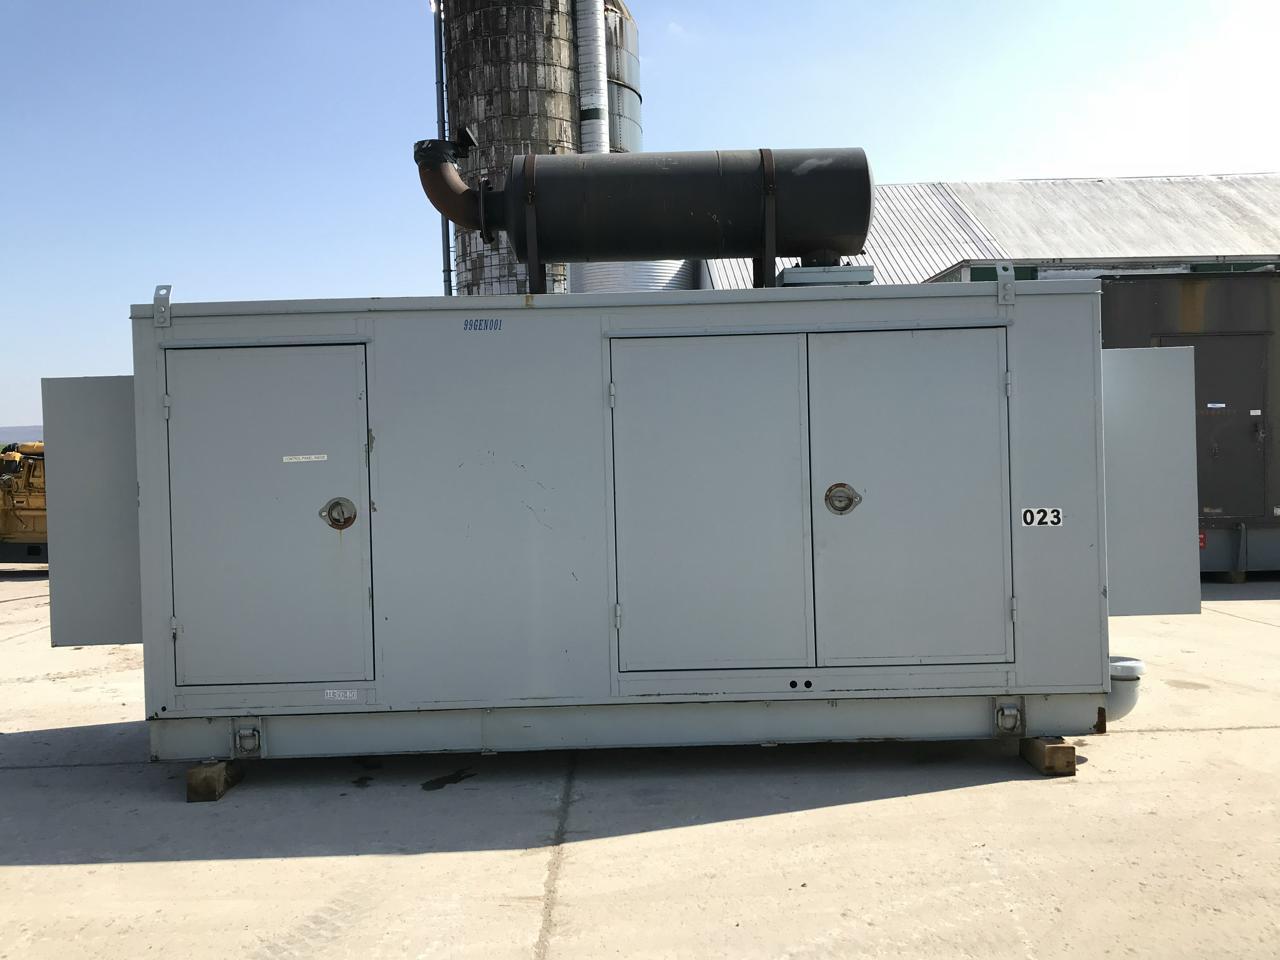 _300 kW Cummins Onan Generator, Base Fuel Tank, Sound Attenuated, 12 Lead